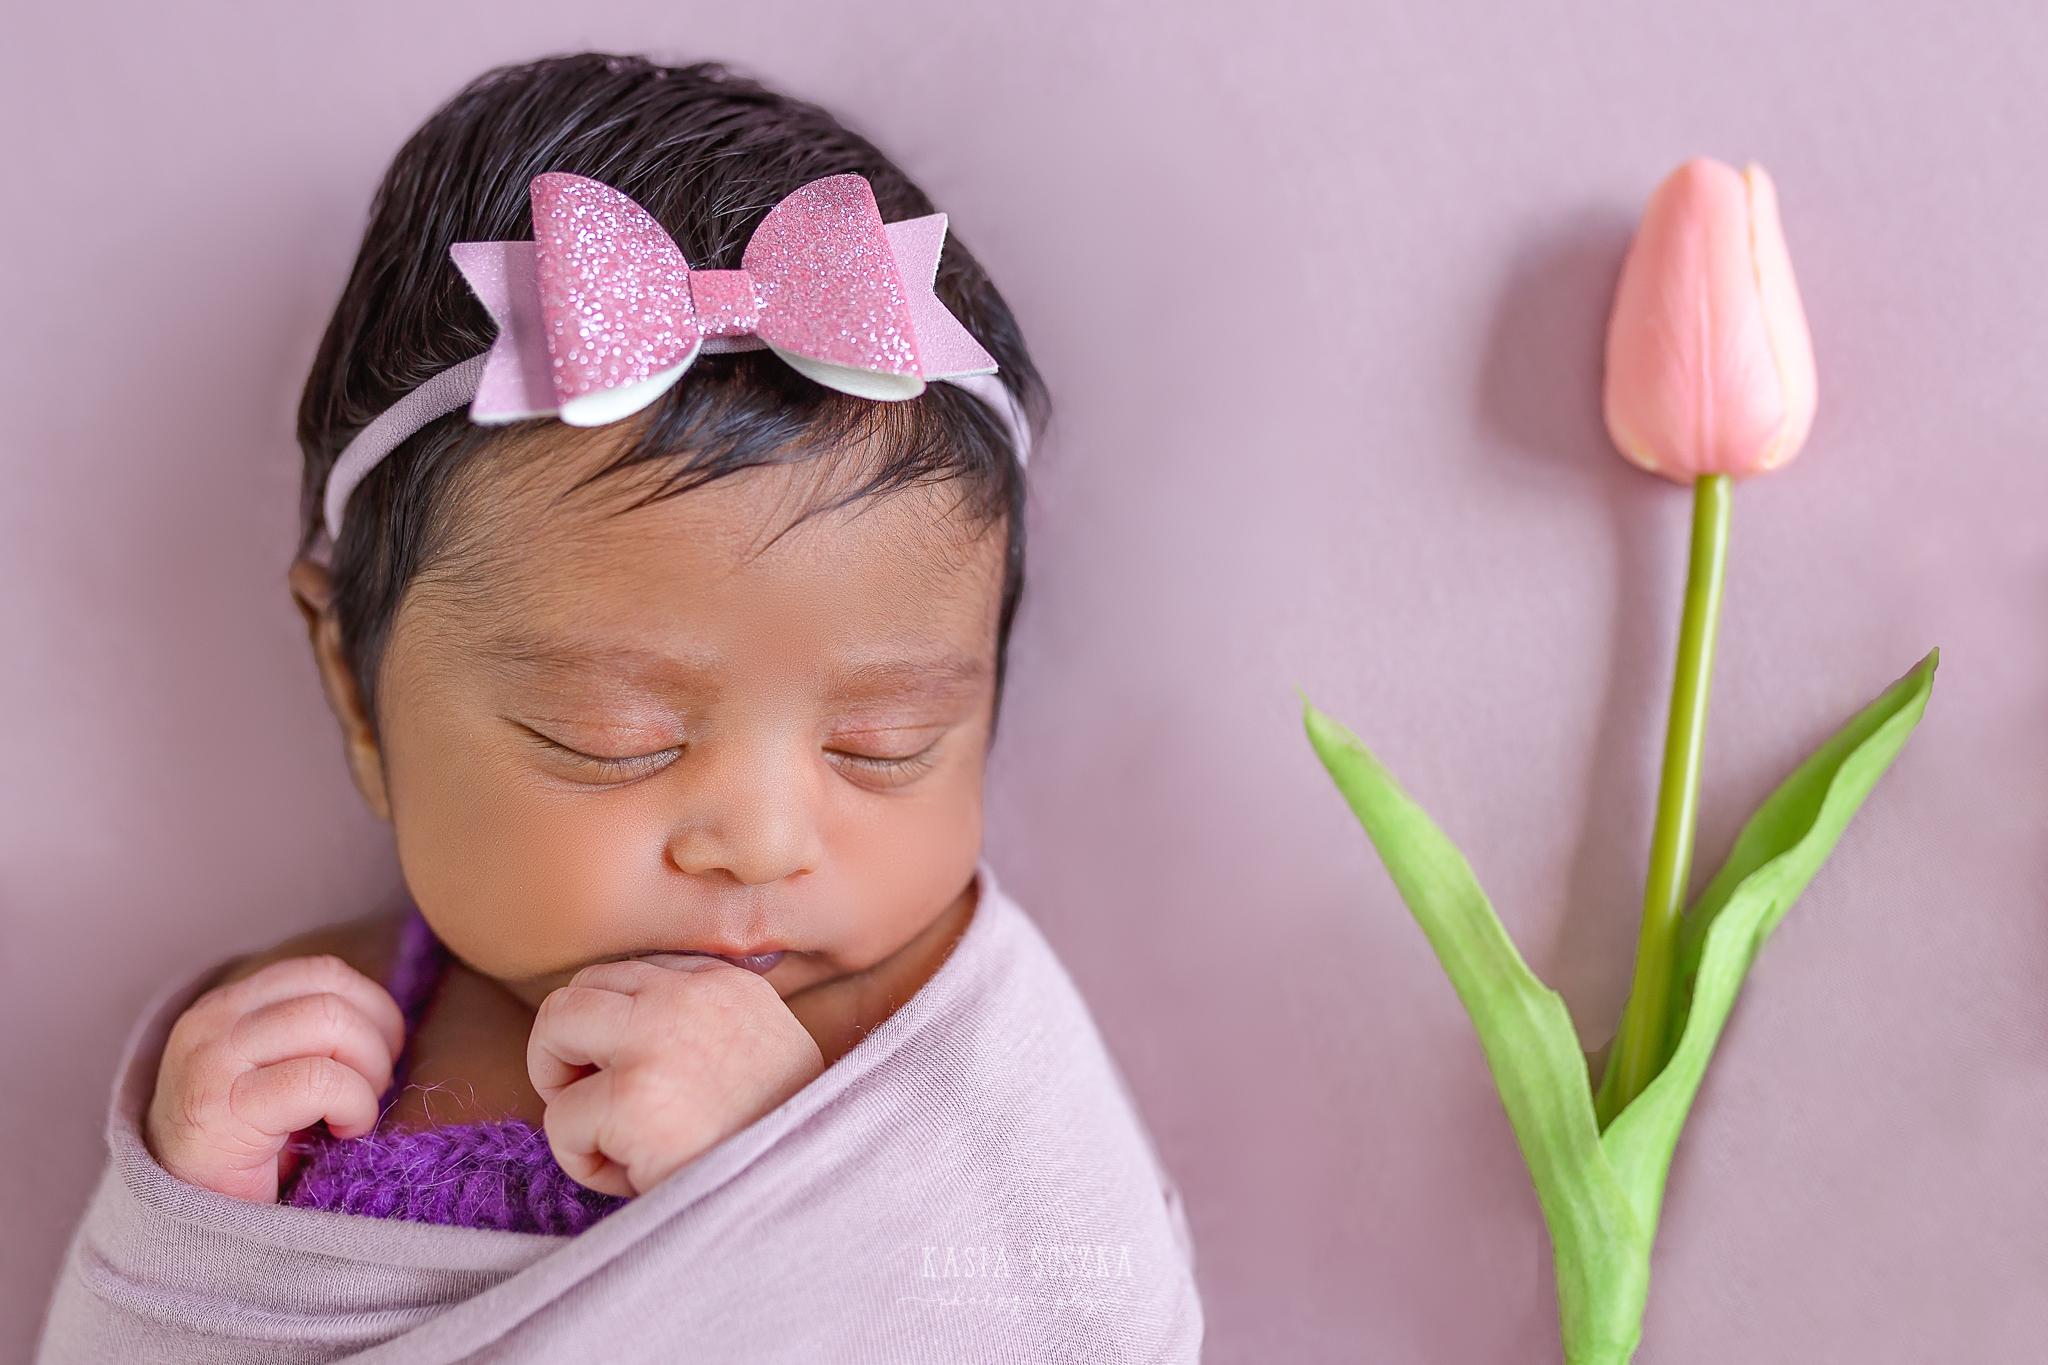 Newborn photography Leeds-Bradford-York-Harrogate: newborn baby girl on a pink blanket